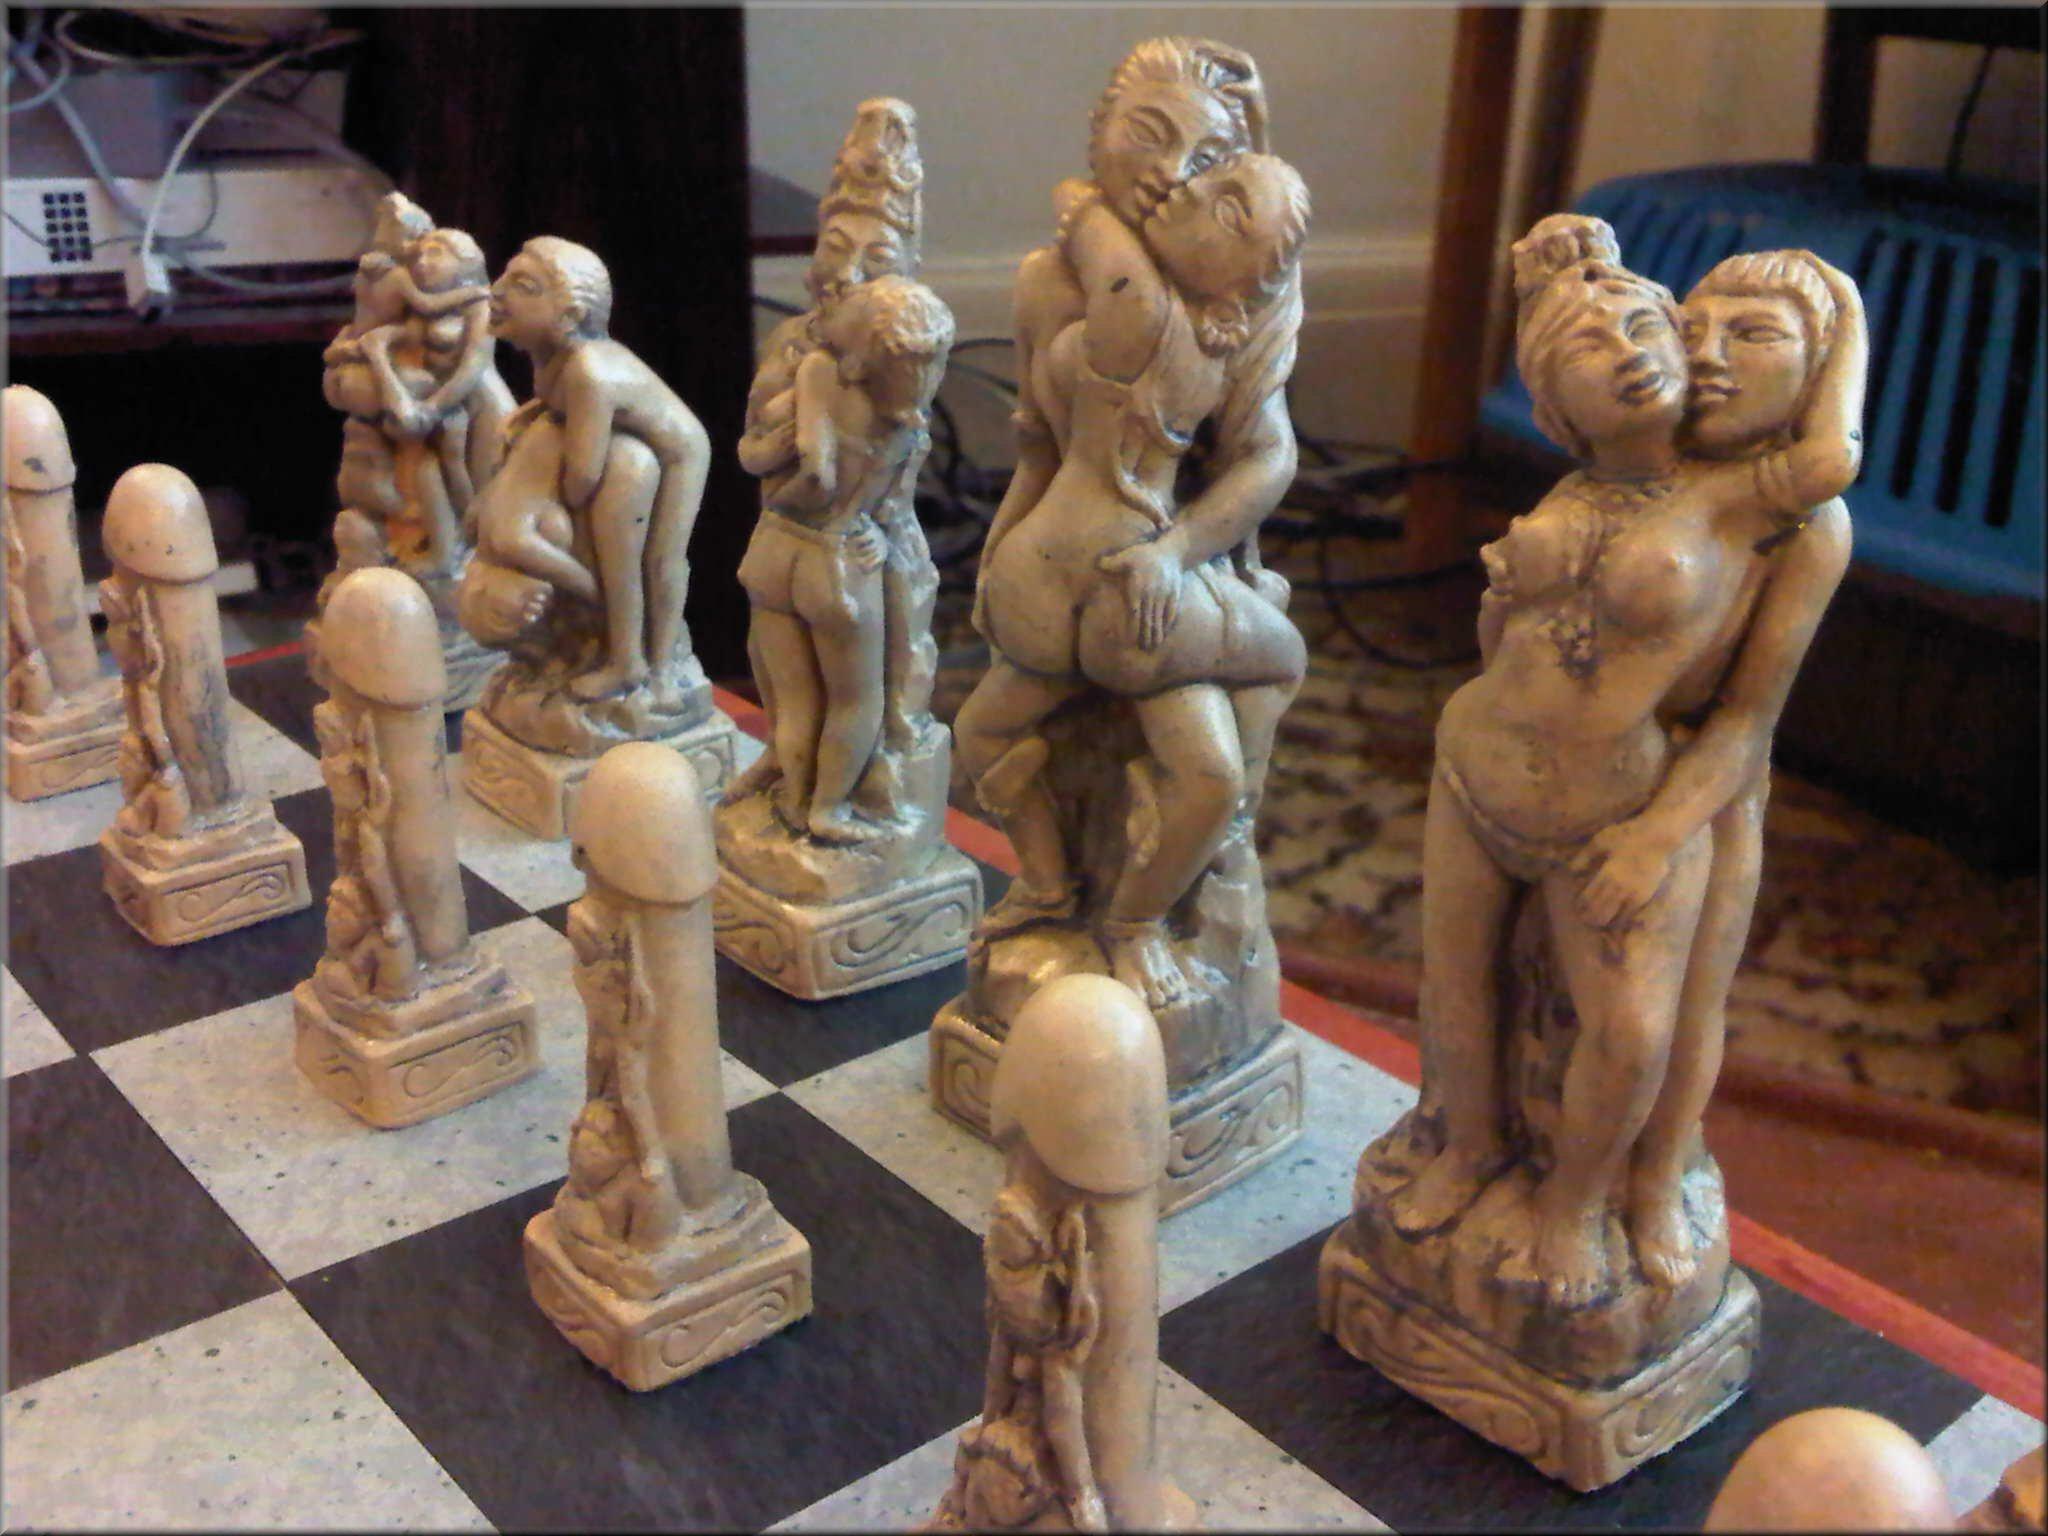 ноги эро фото шахматы - 7